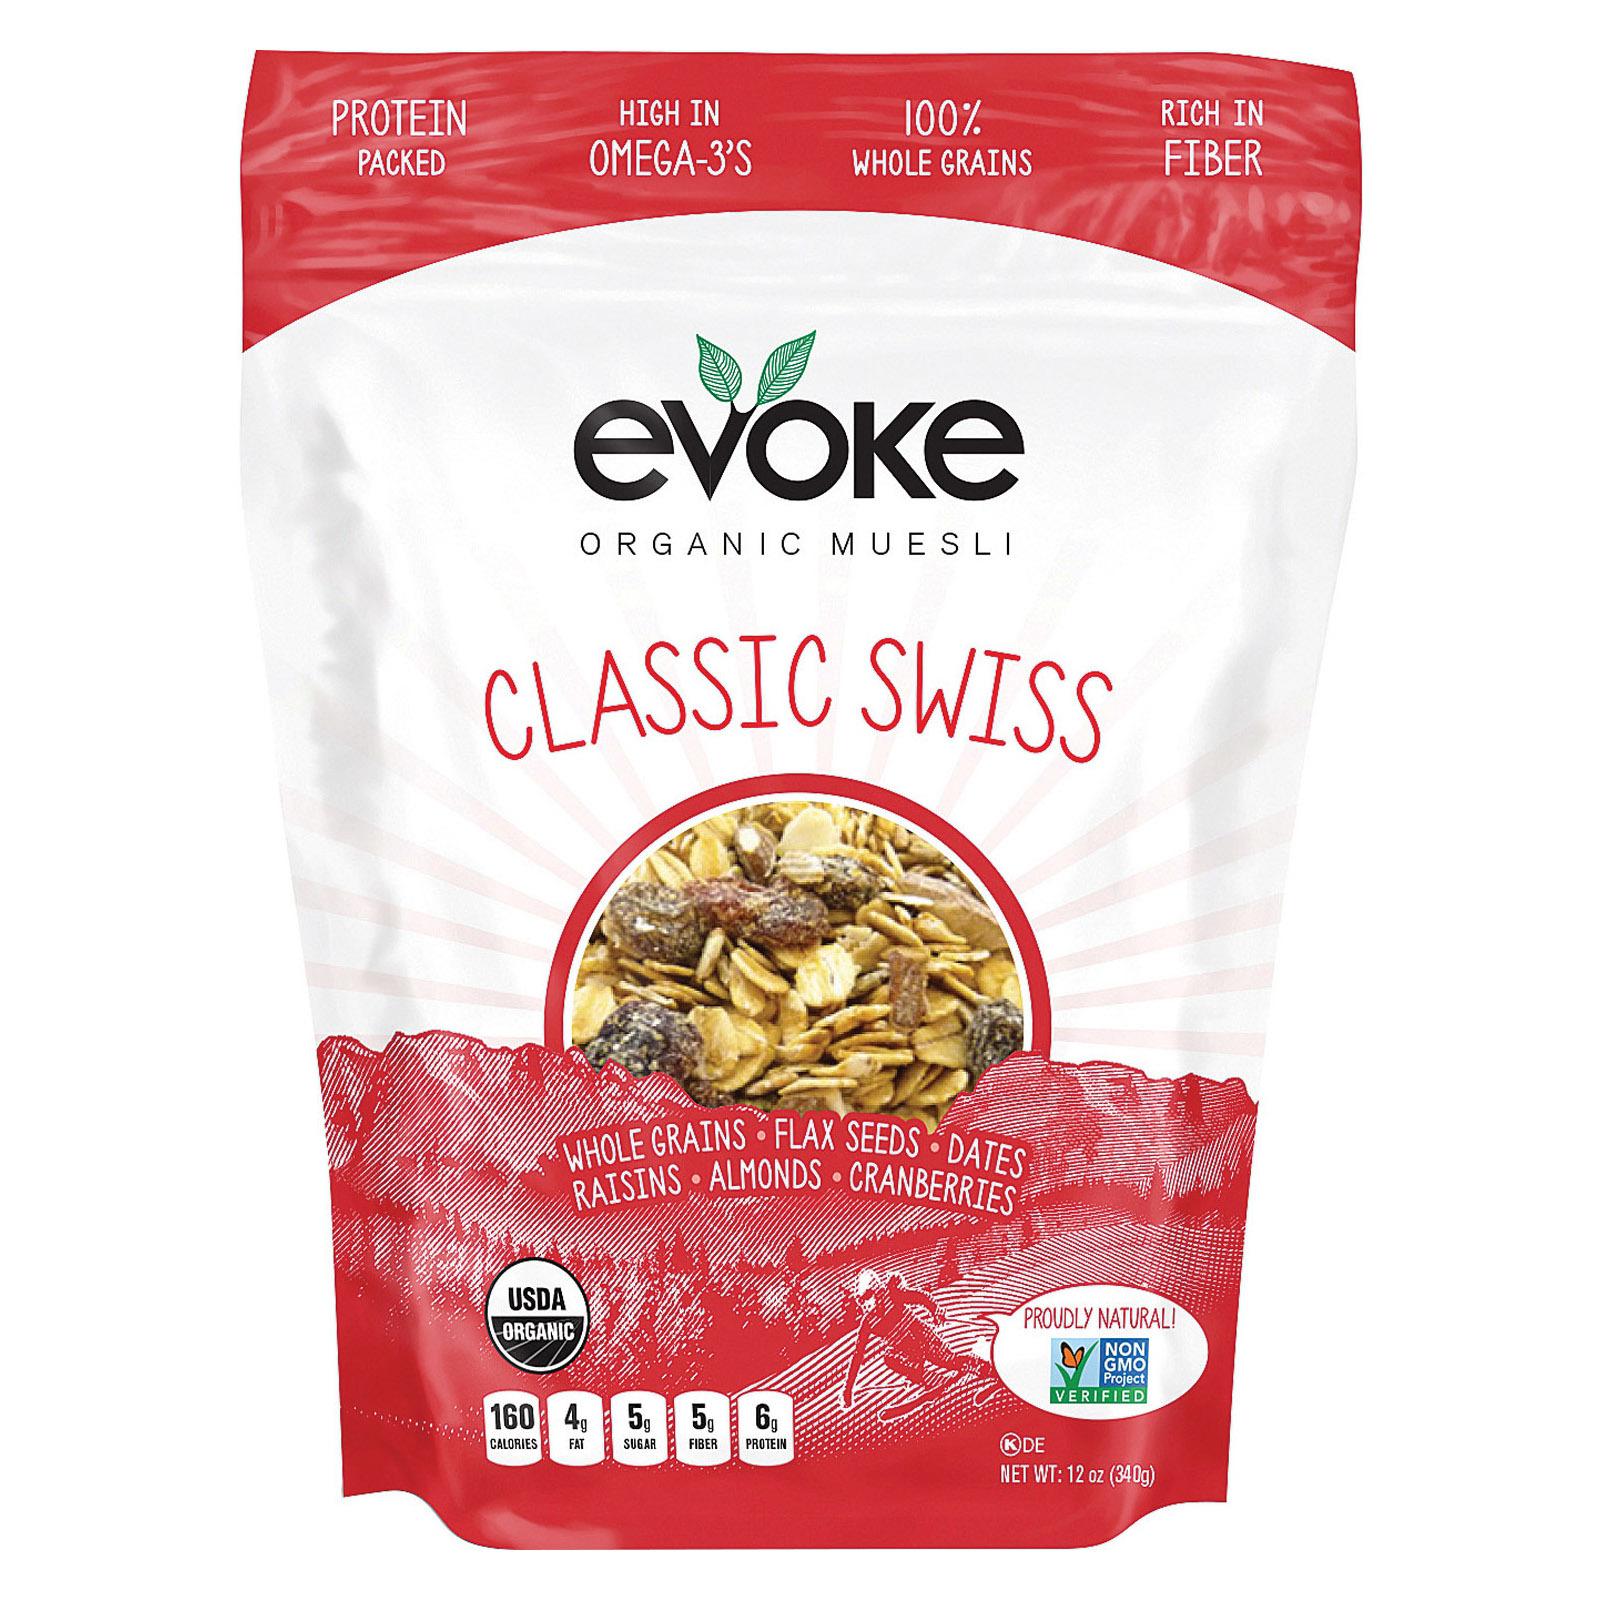 Evoke Healthy Foods Classic Swiss Organic Muesli - Organic Muesli - Case of 6 - 12 oz.